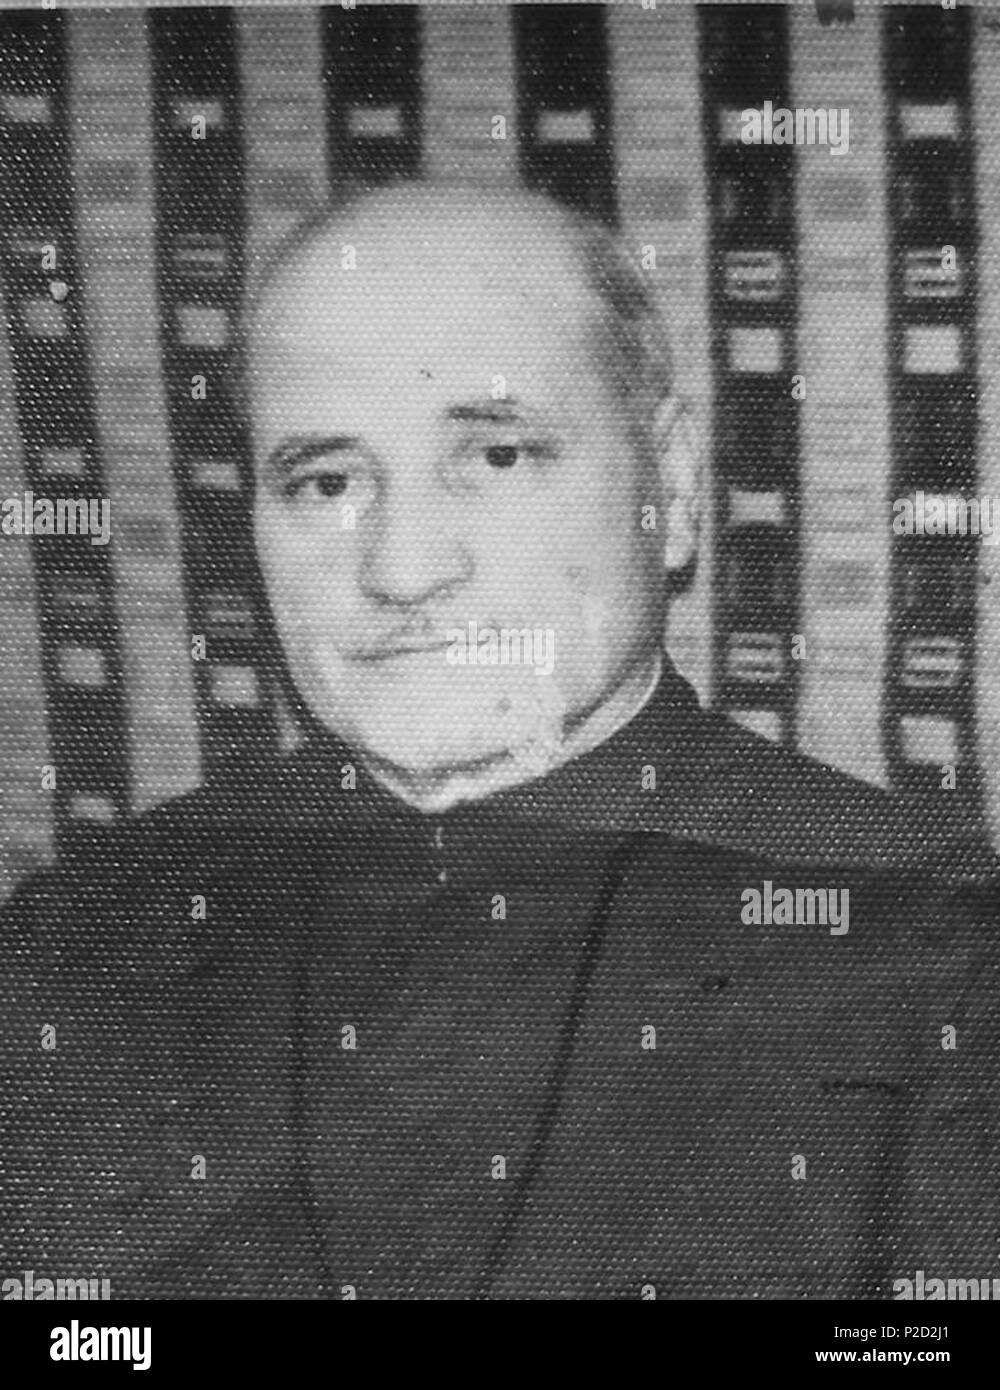 1 1968 - Preotul Grigore Bejan (fost detinut politic) Stock Photo